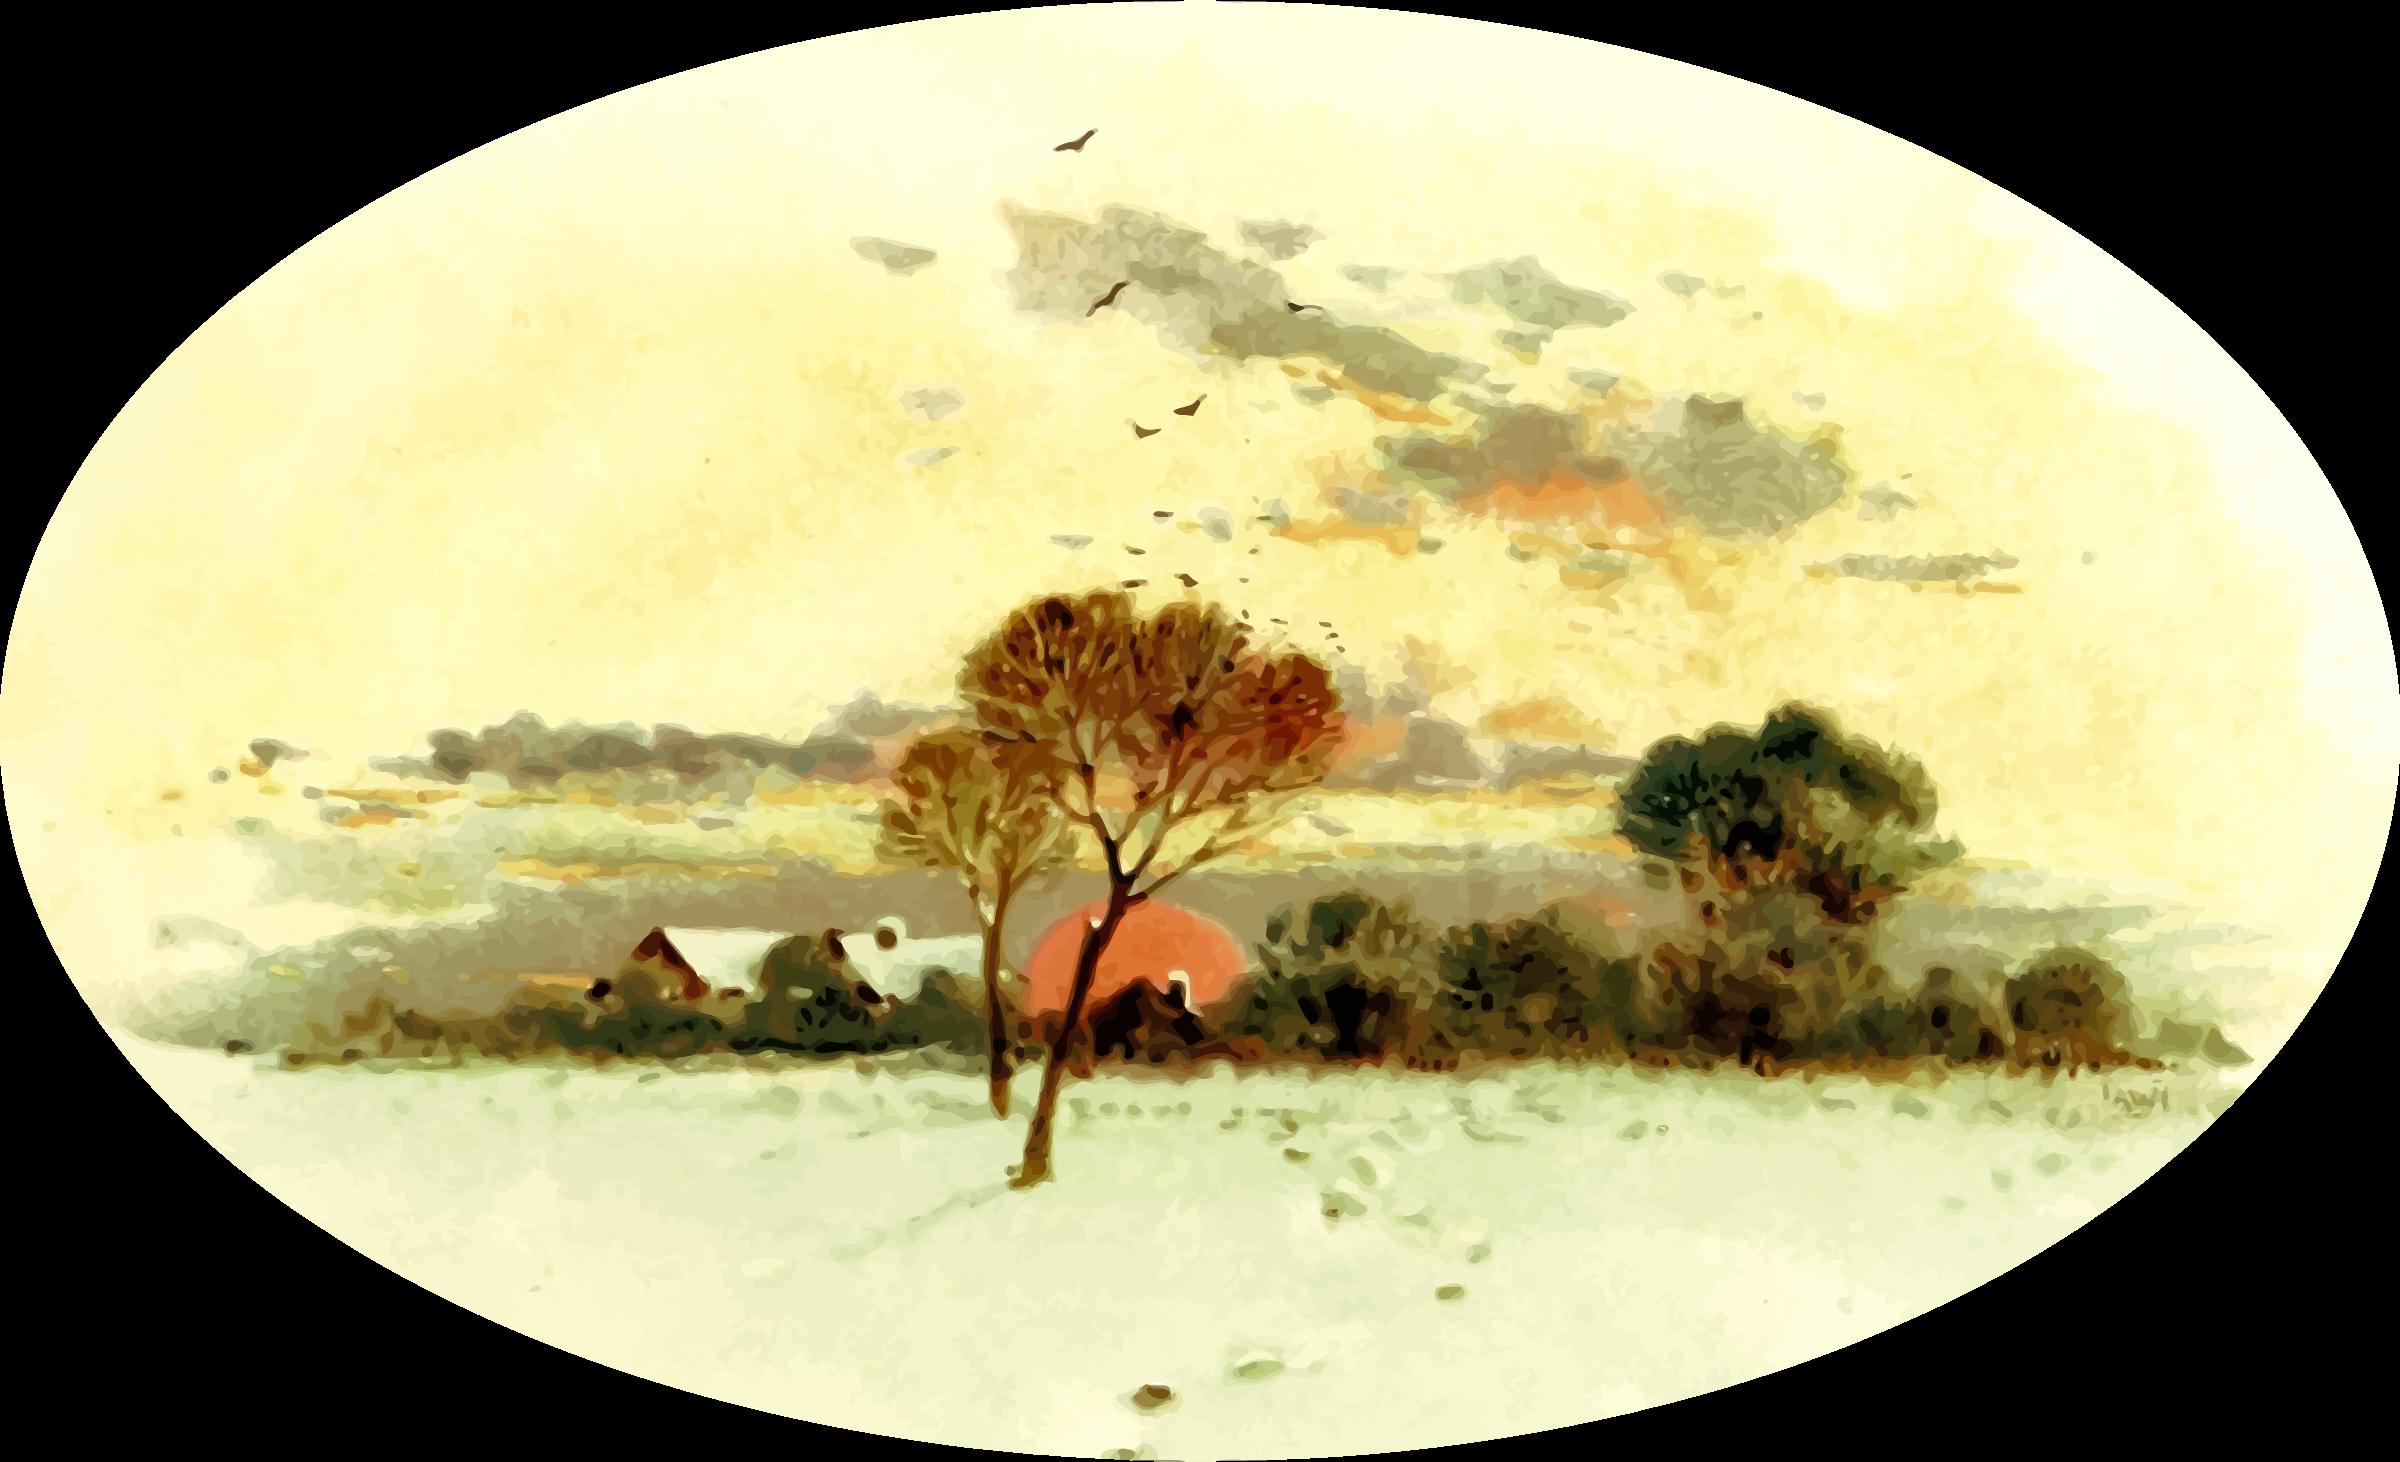 Savanna tree clipart graphic transparent download Clipart - Country scene 6 graphic transparent download